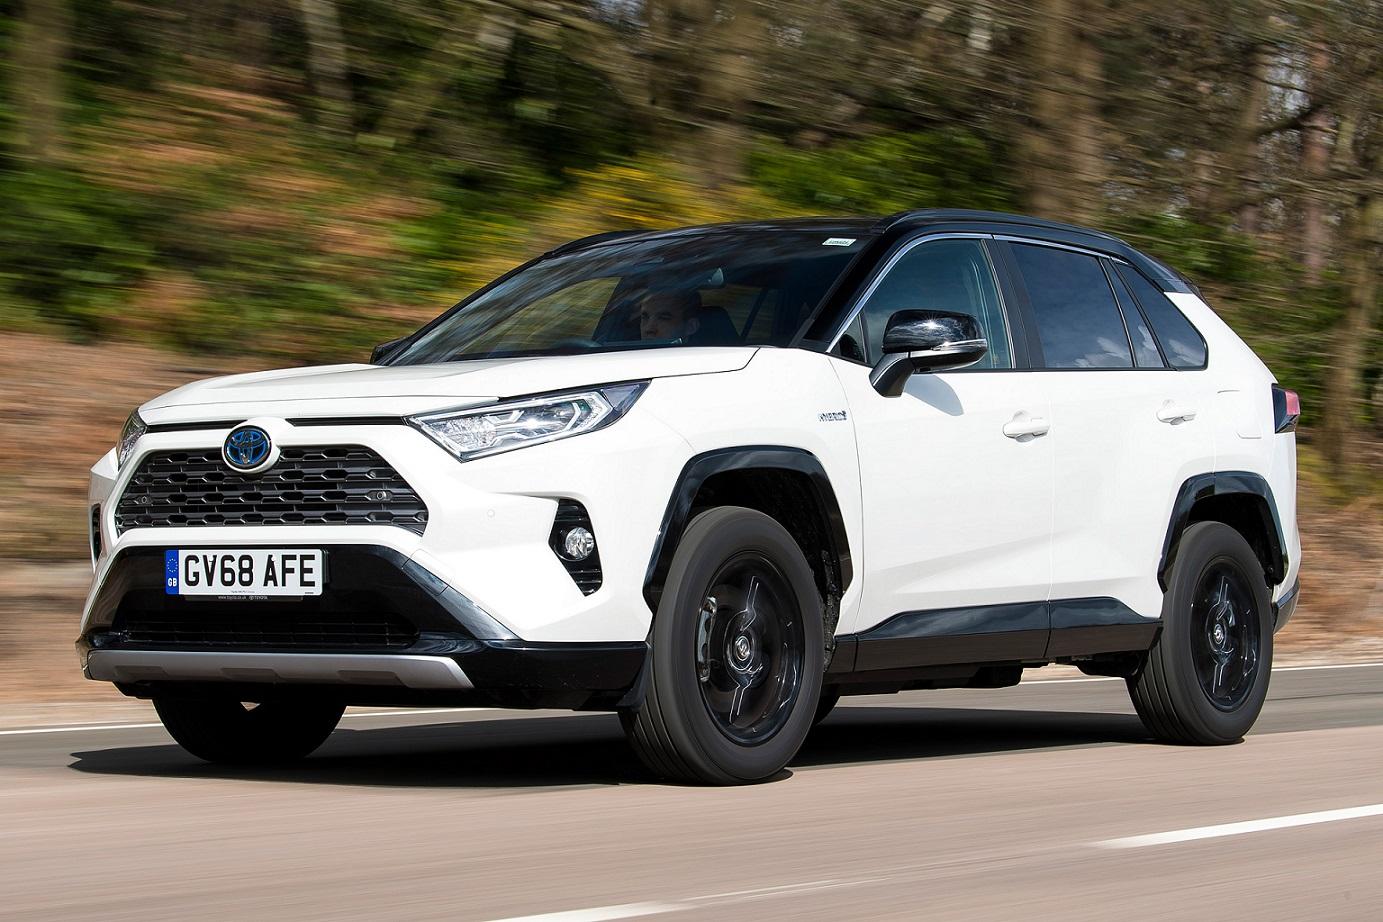 La nuova Toyota RAV4 elettrica arriverà nel 2022